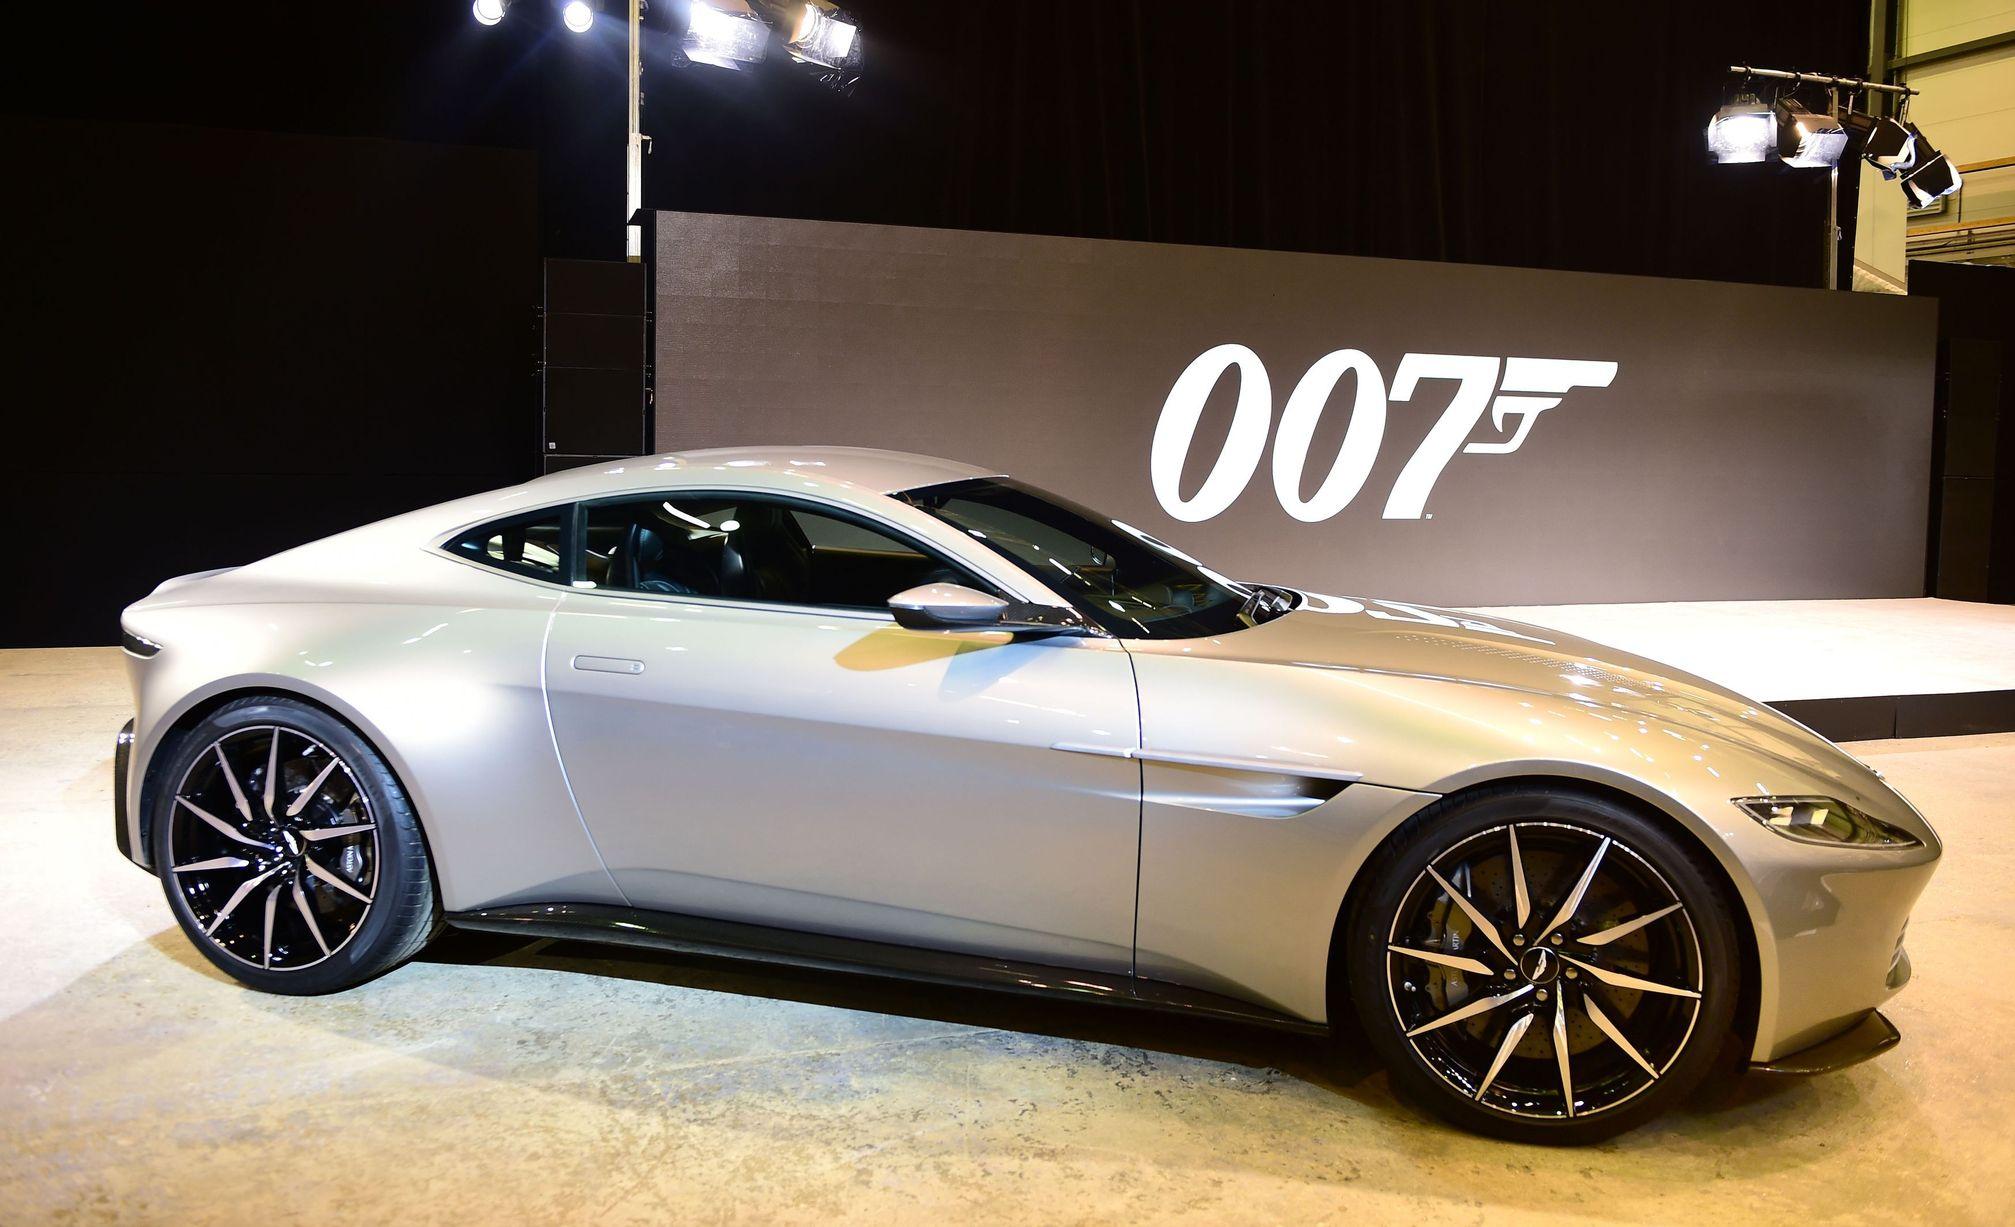 Aston Martin Db10 007 S New Ride Ruf Lyf